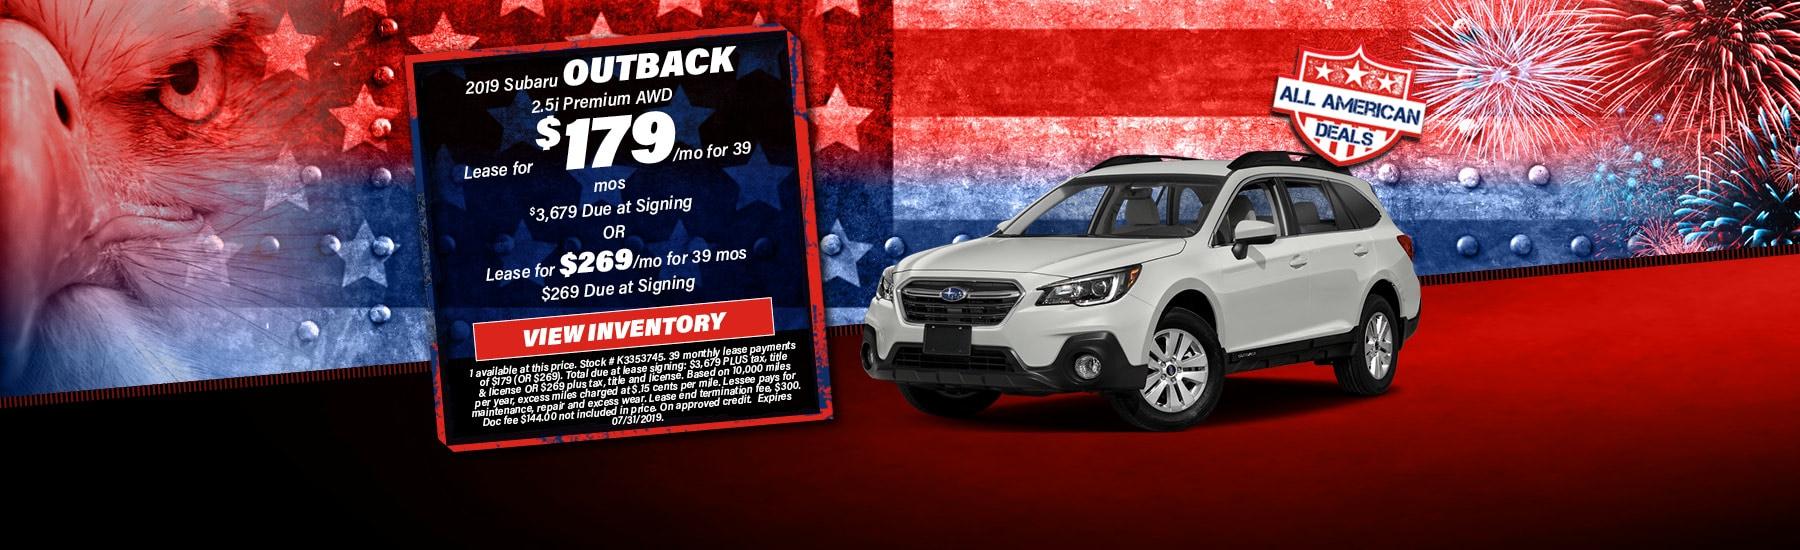 Subaru Dealers Pittsburgh >> New Used Subaru Dealer In Moon Township Subaru Of Moon Township